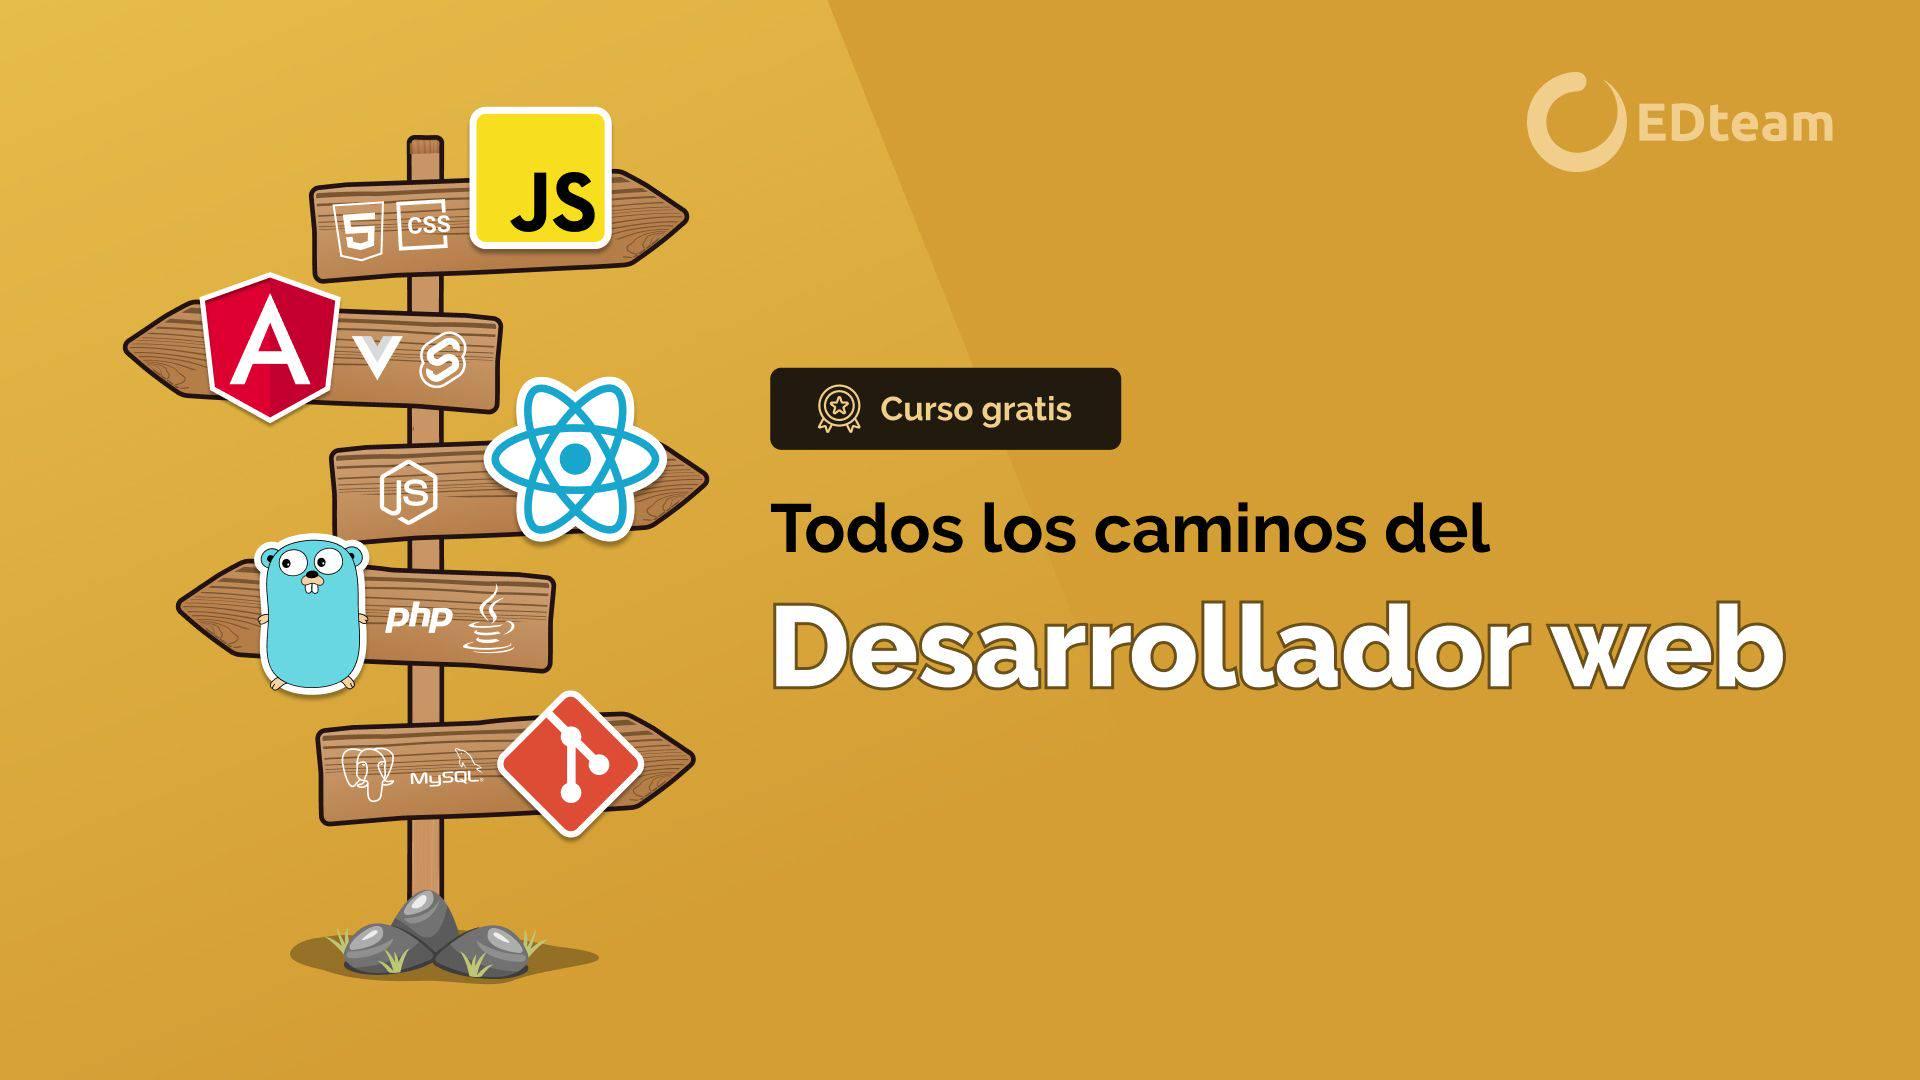 1.4 - Tecnologías web: HTML, CSS, JavaScript